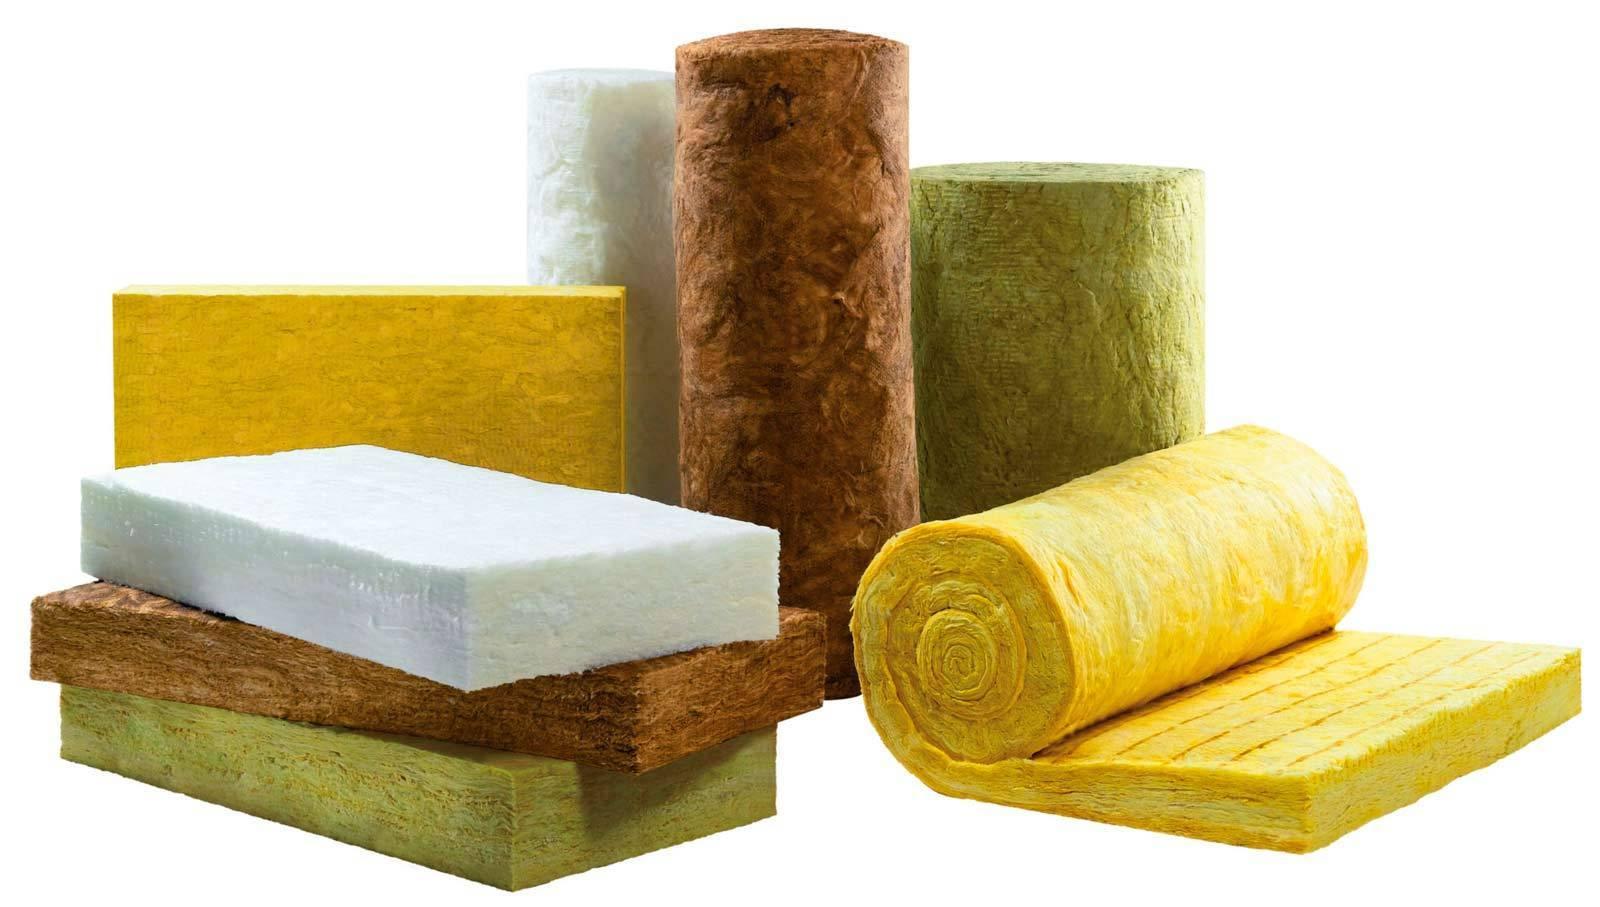 Выбираем теплоизоляцию — базальтовая вата, минвата или стекловата